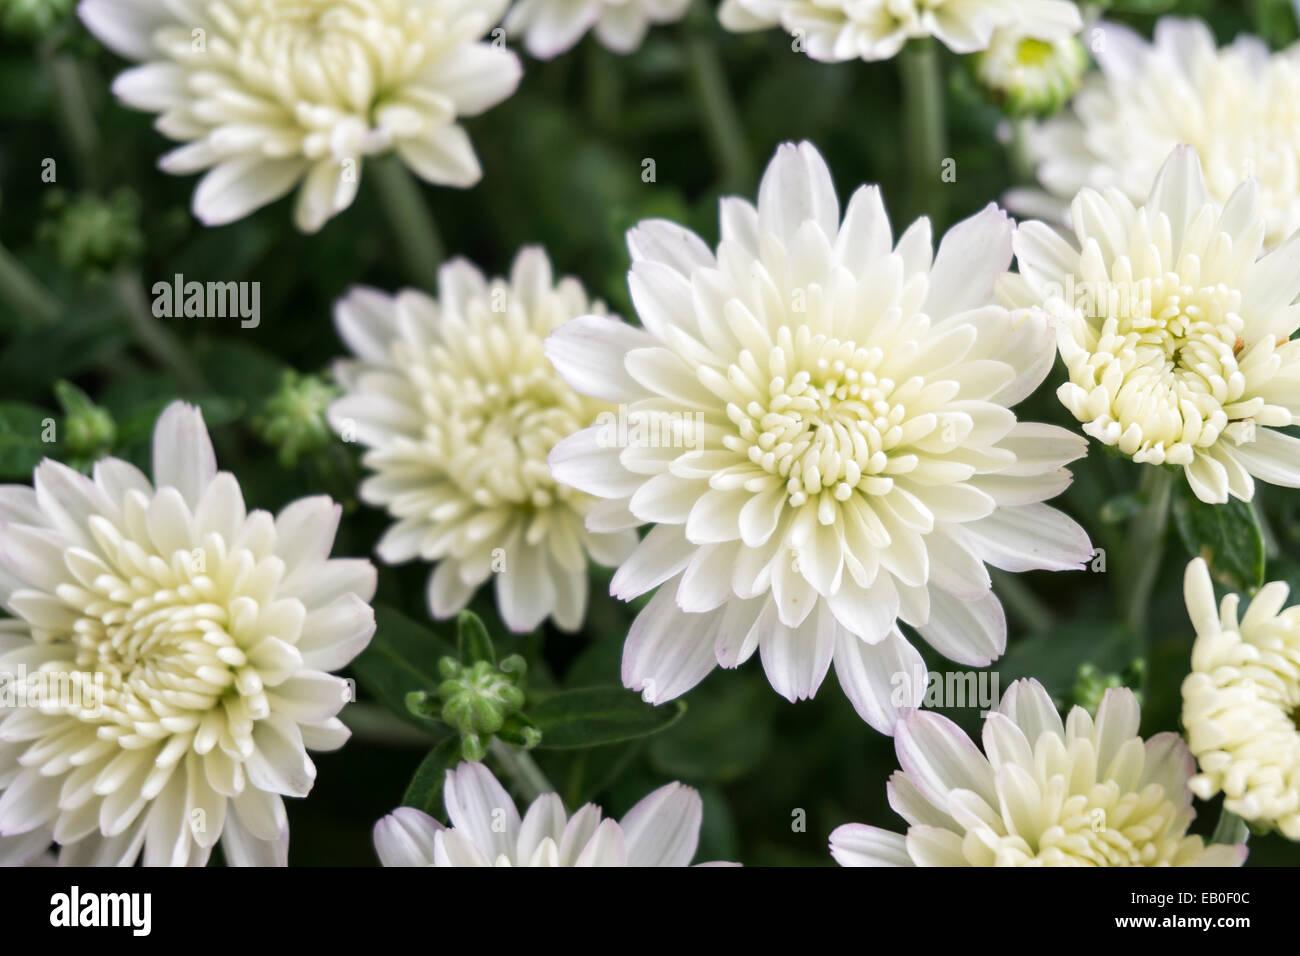 Closeup Of White Chrysanthemum Flower In Field Stock Photo 75614460